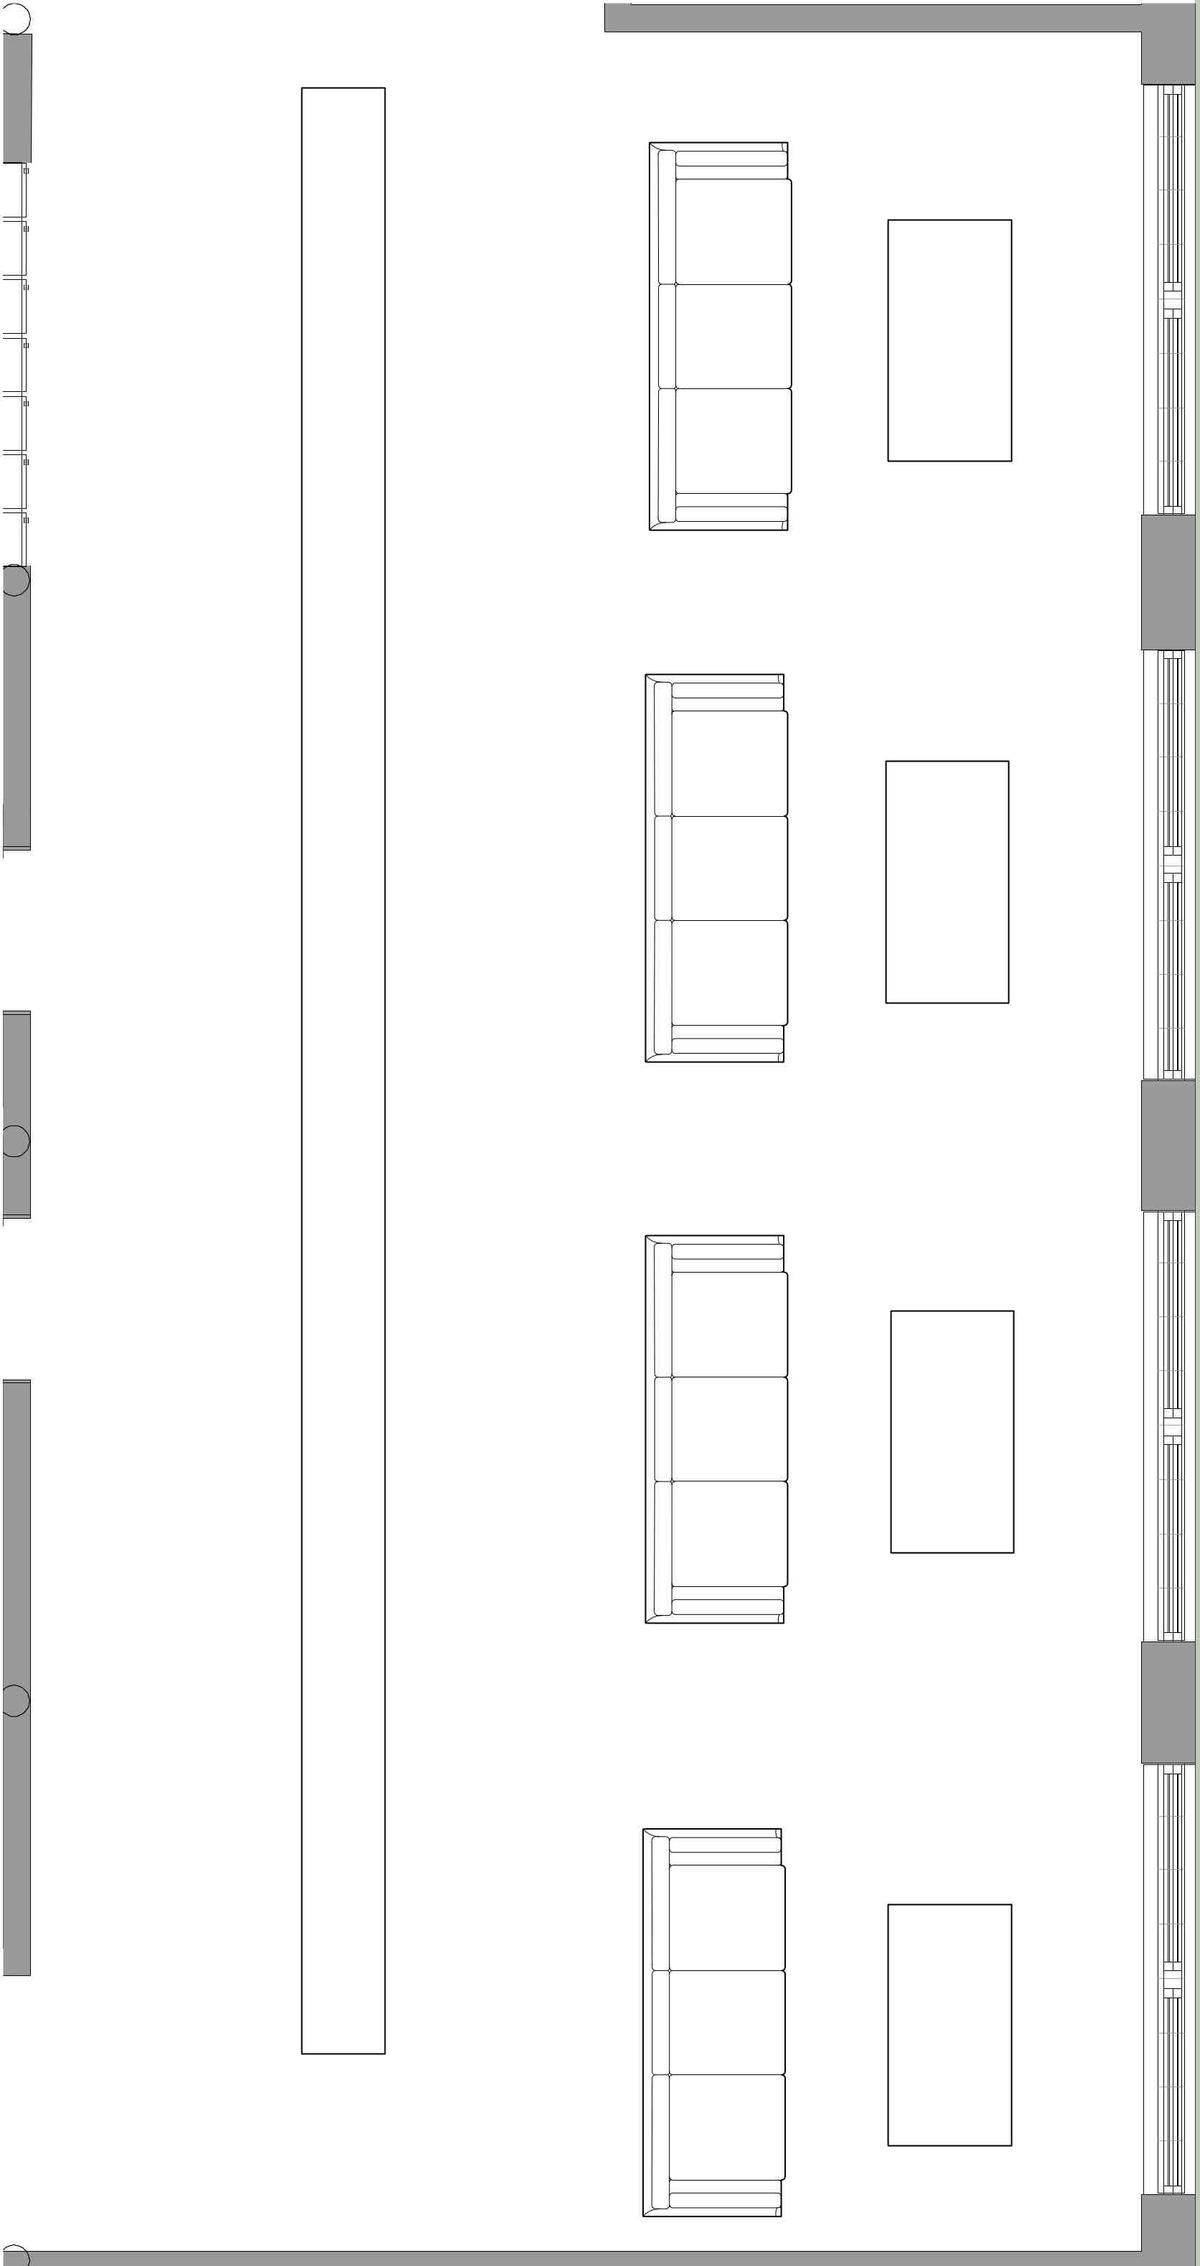 Enlarged Lounge floor plan